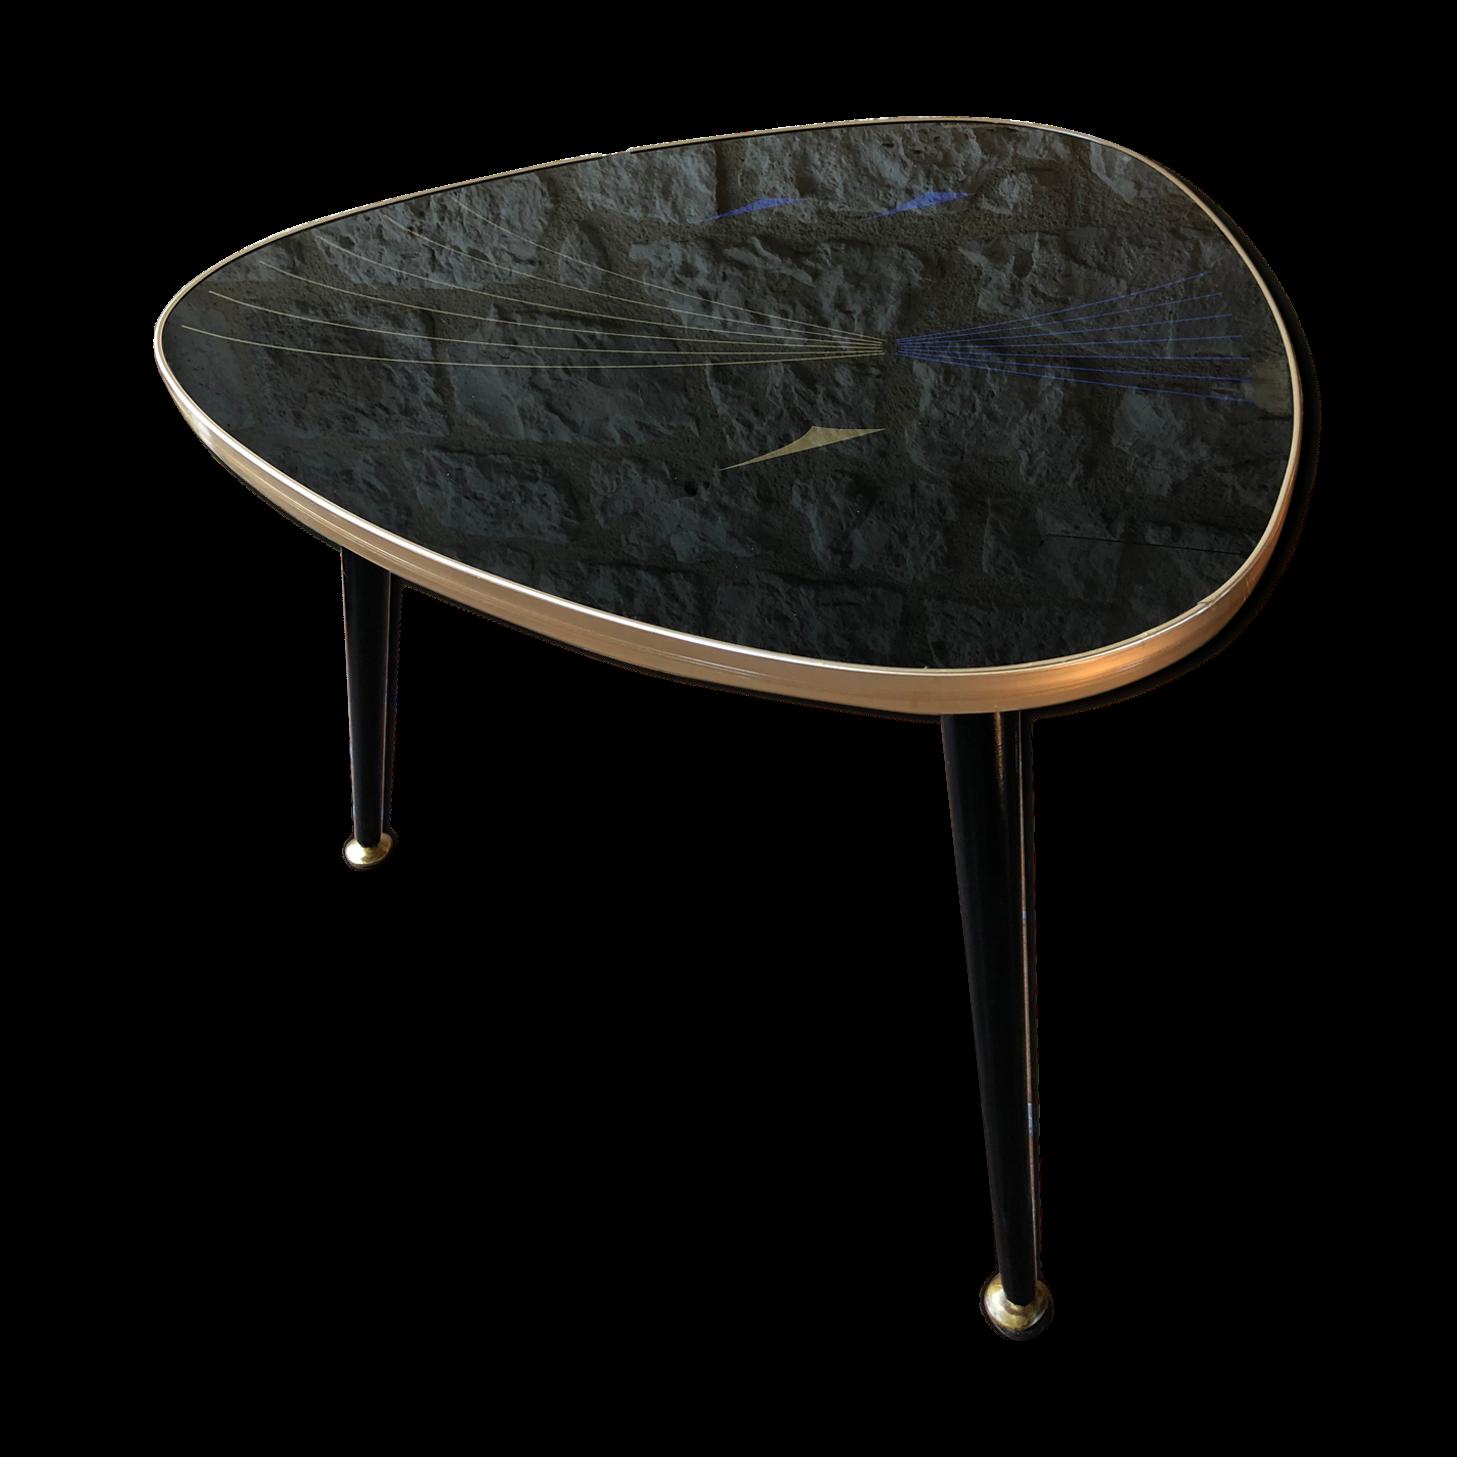 Table Basse En Formica table basse tripode vintage plexiglas et formica, années 60